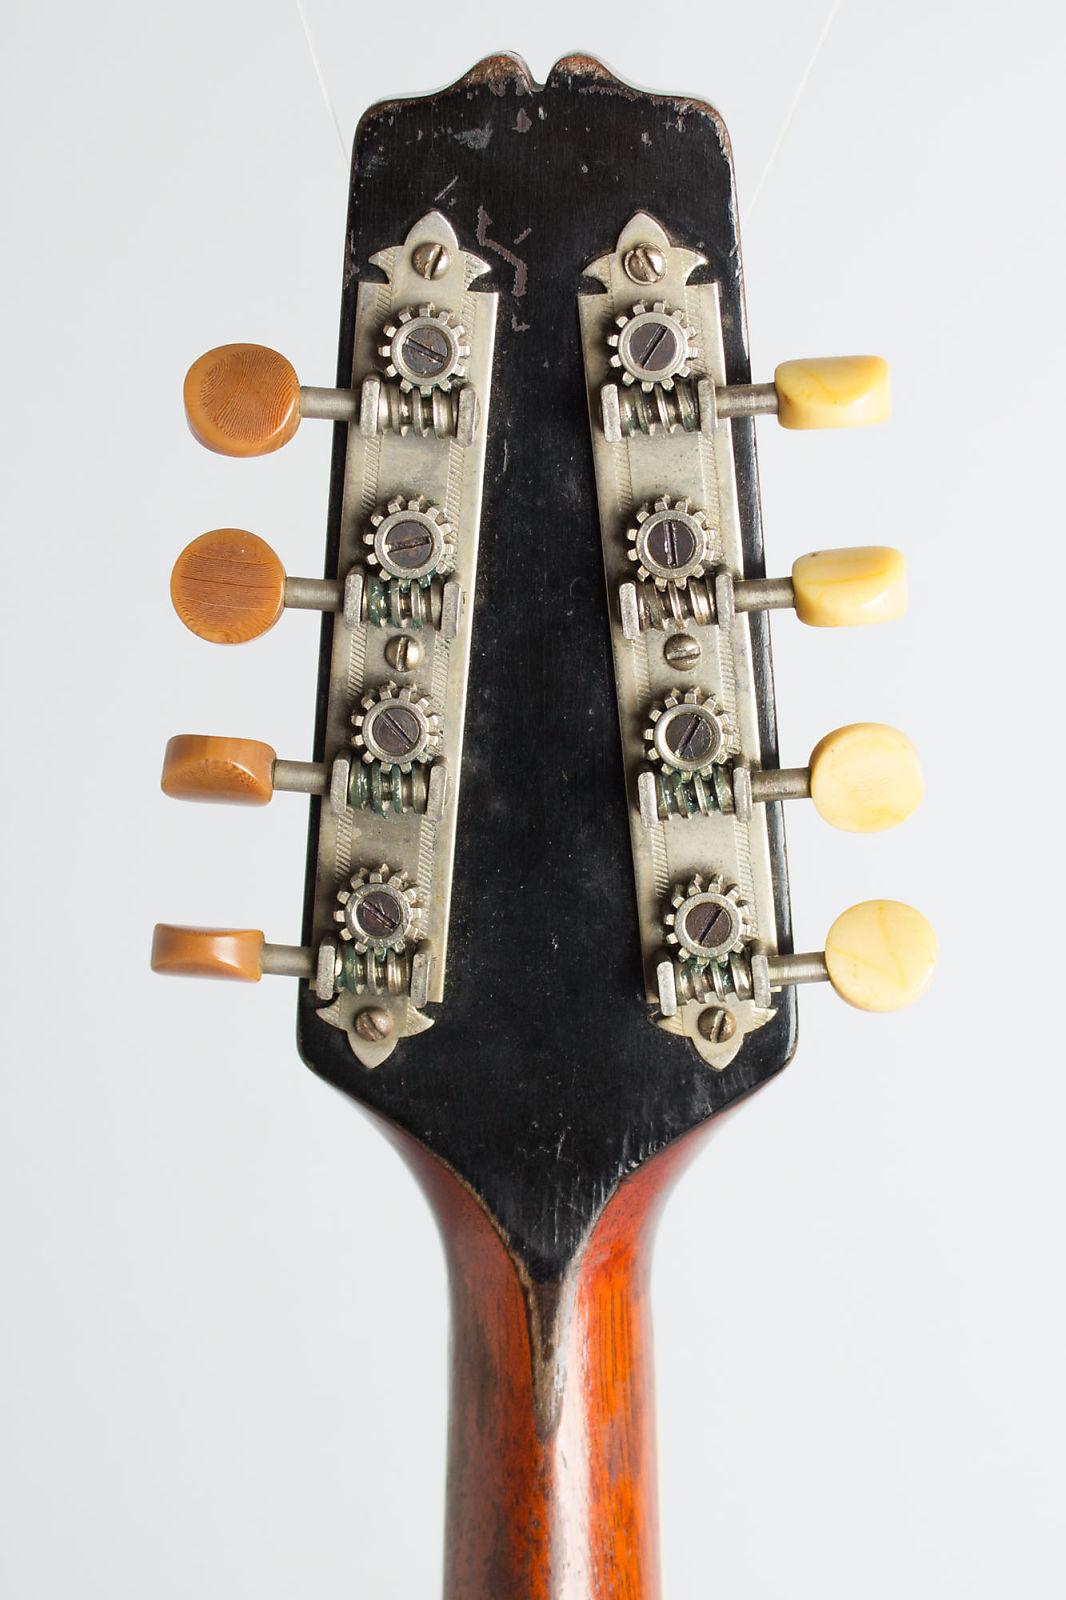 Gibson  Model A-4 Snakehead Carved Top Mandolin (1924), ser. #78315, original black hard shell case.